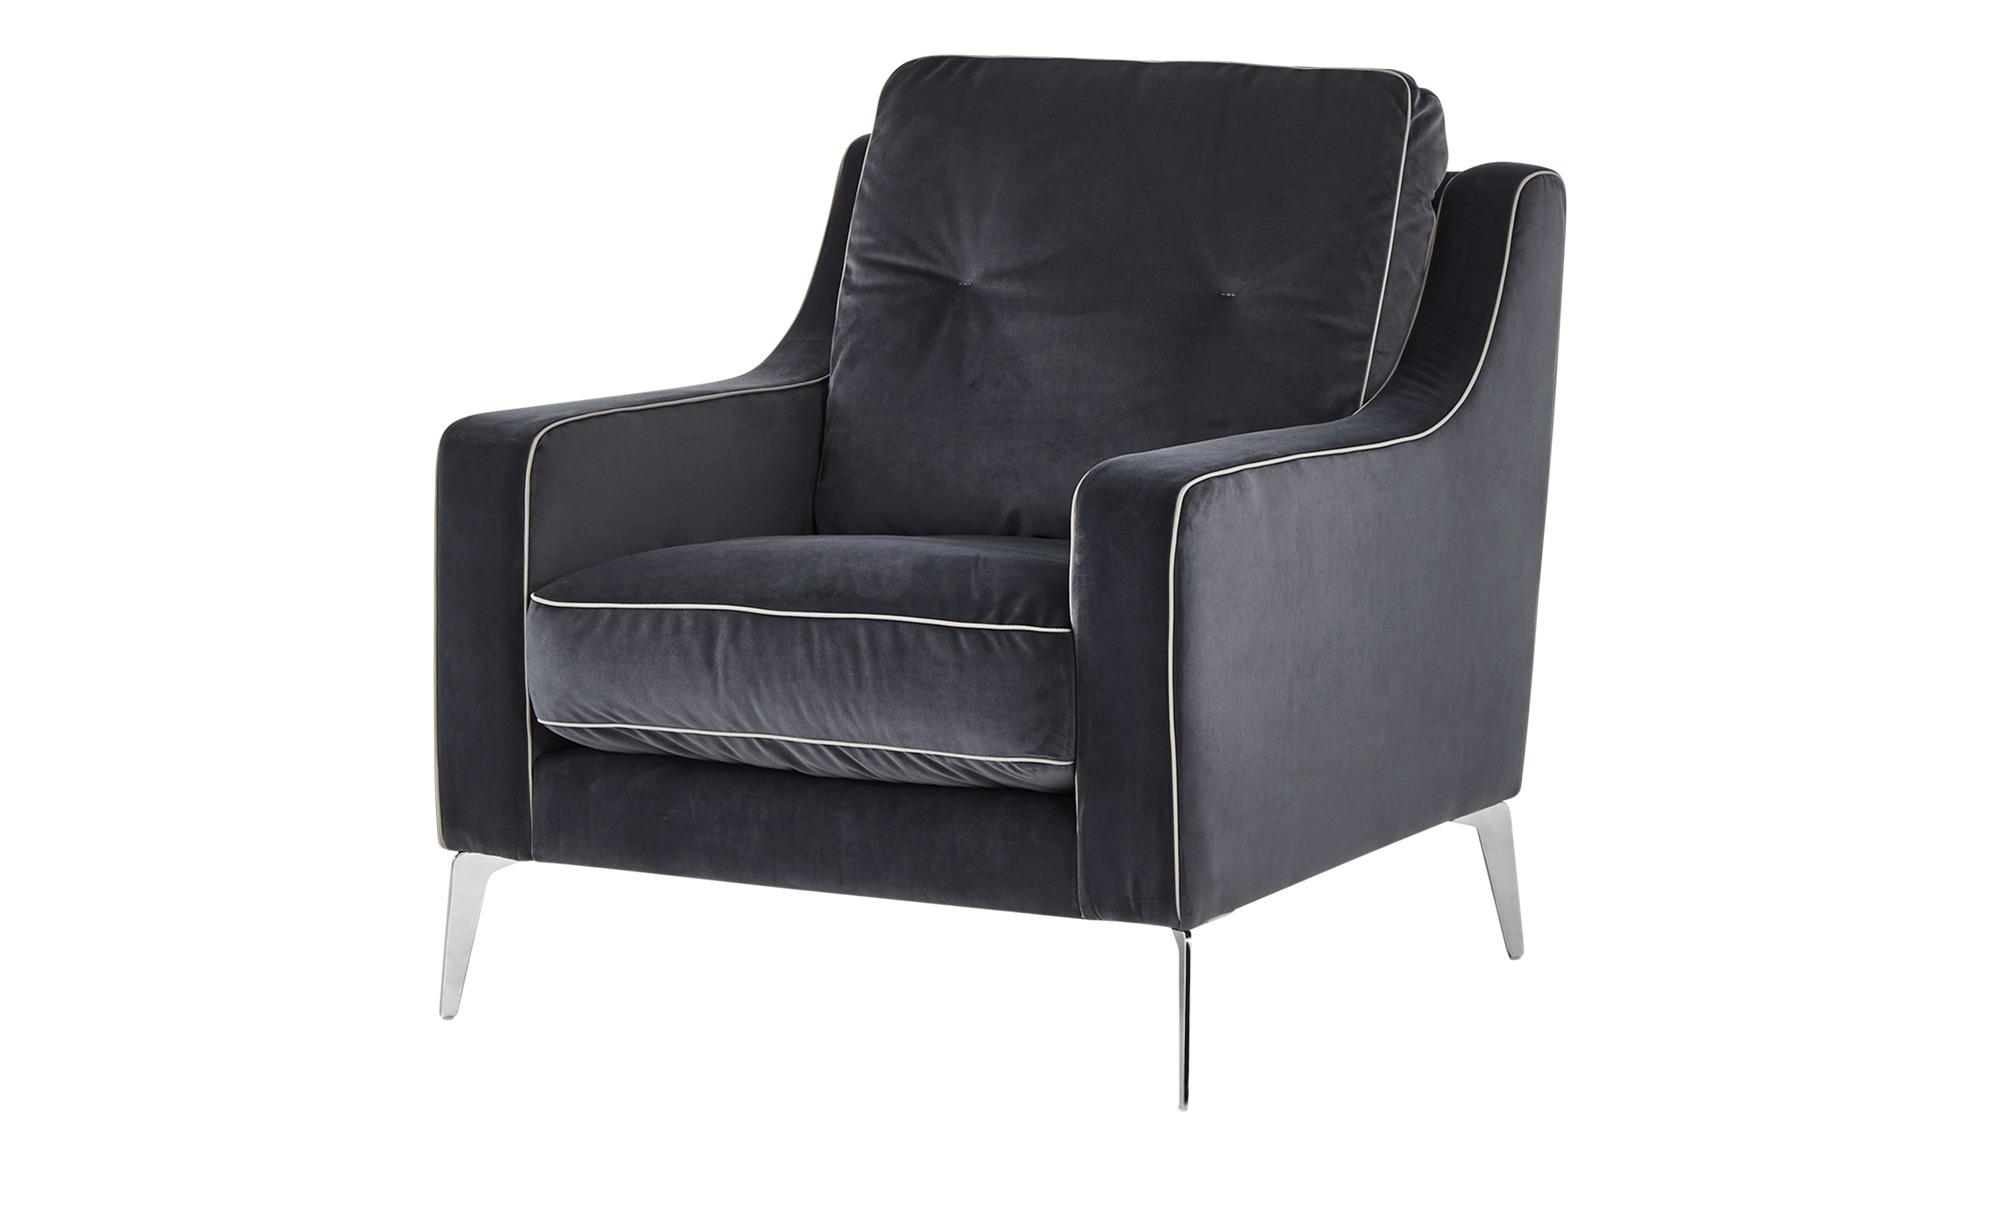 Sessel  Michigan ¦ Maße (cm): B: 86 H: 90 T: 92 Polstermöbel > Sessel > Polstersessel - Höffner